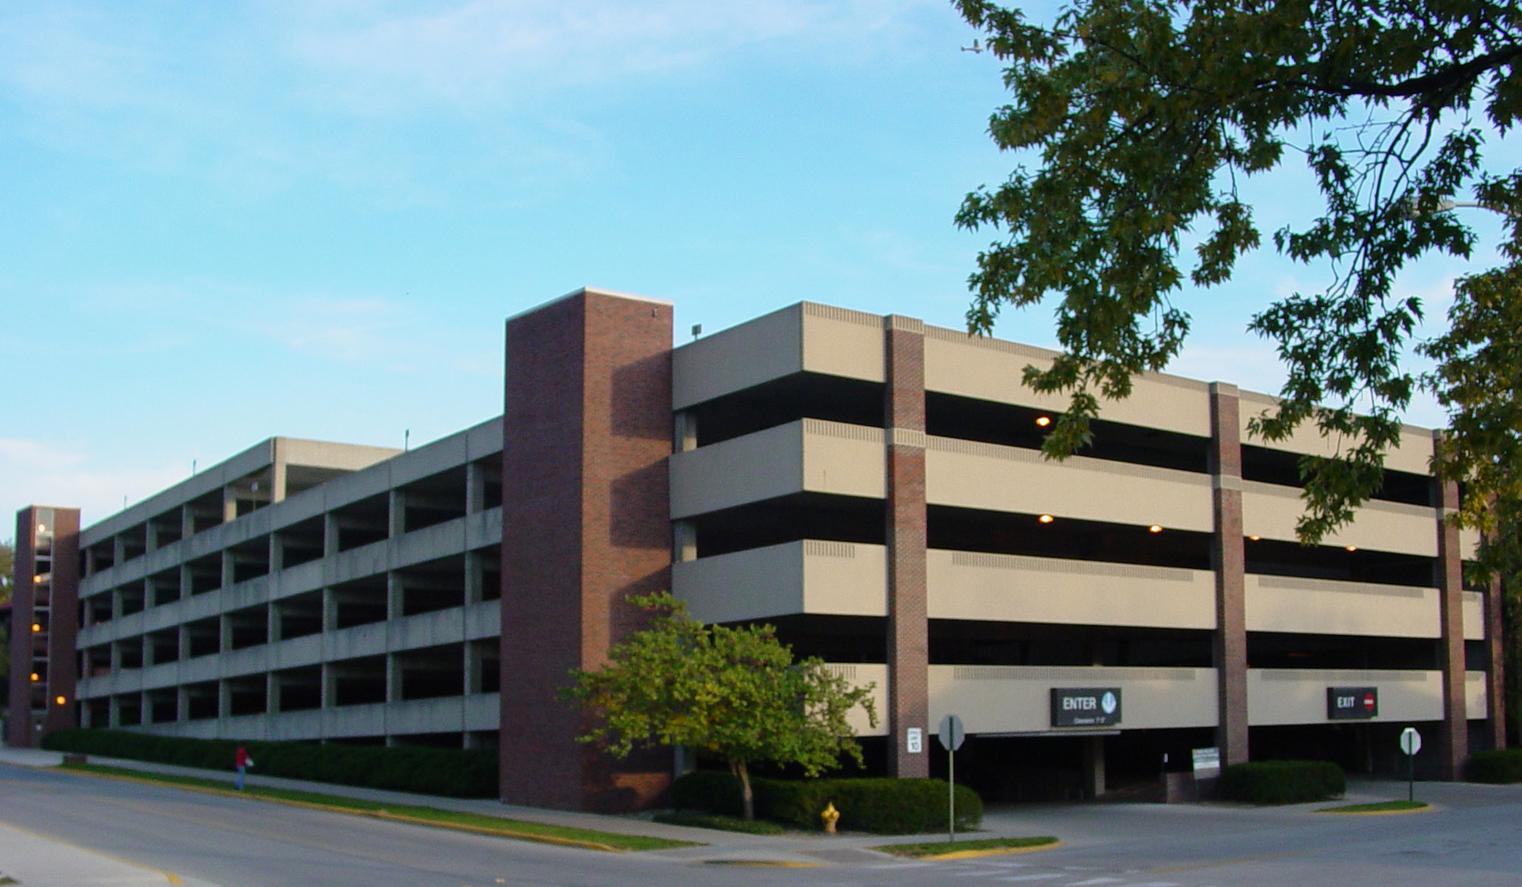 purdue university parking garage repair & restoration projects